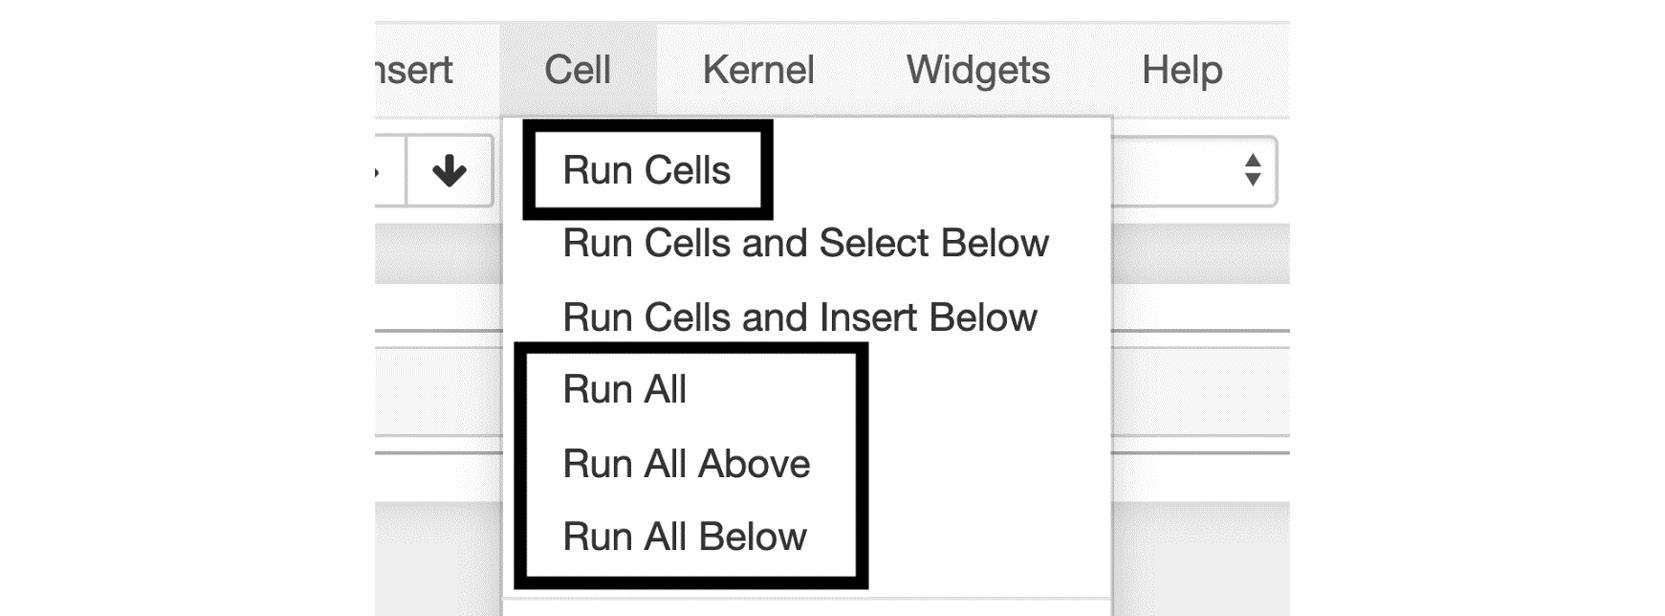 Figure 1.11: Menu options for running cells in bulk